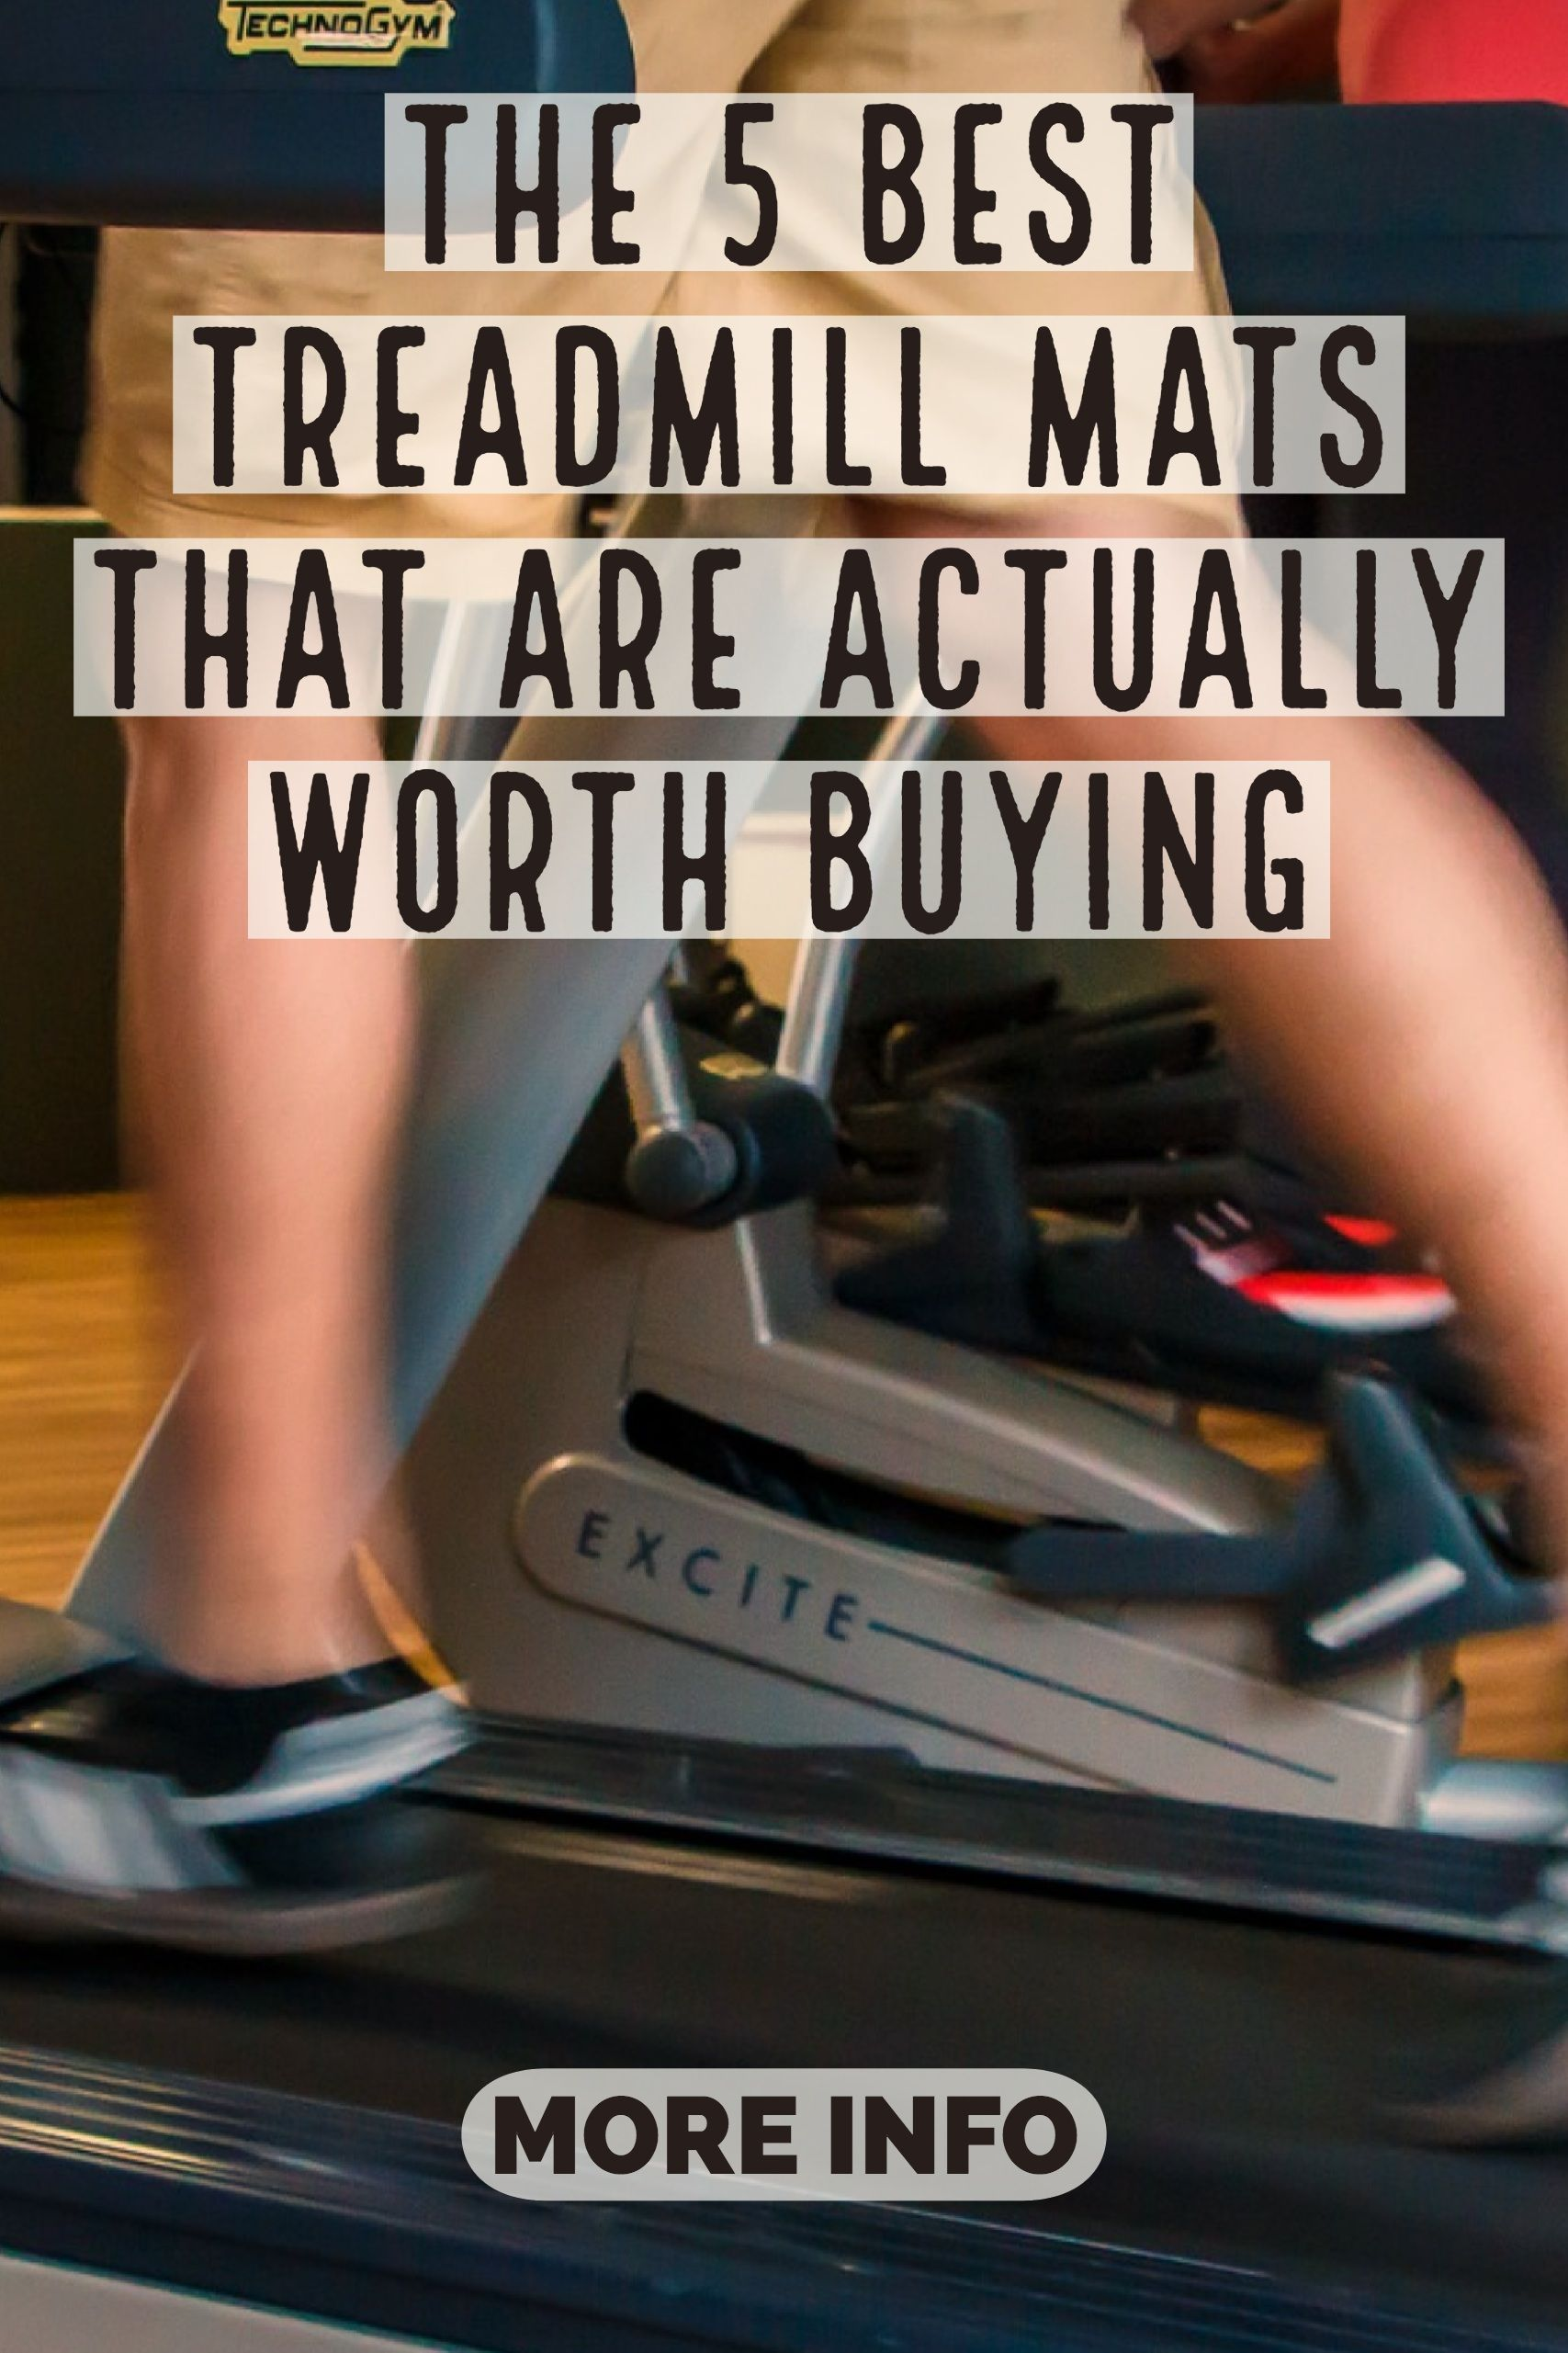 The 5 Best Treadmill Mats For Hardwood Carpet In 2020 Train